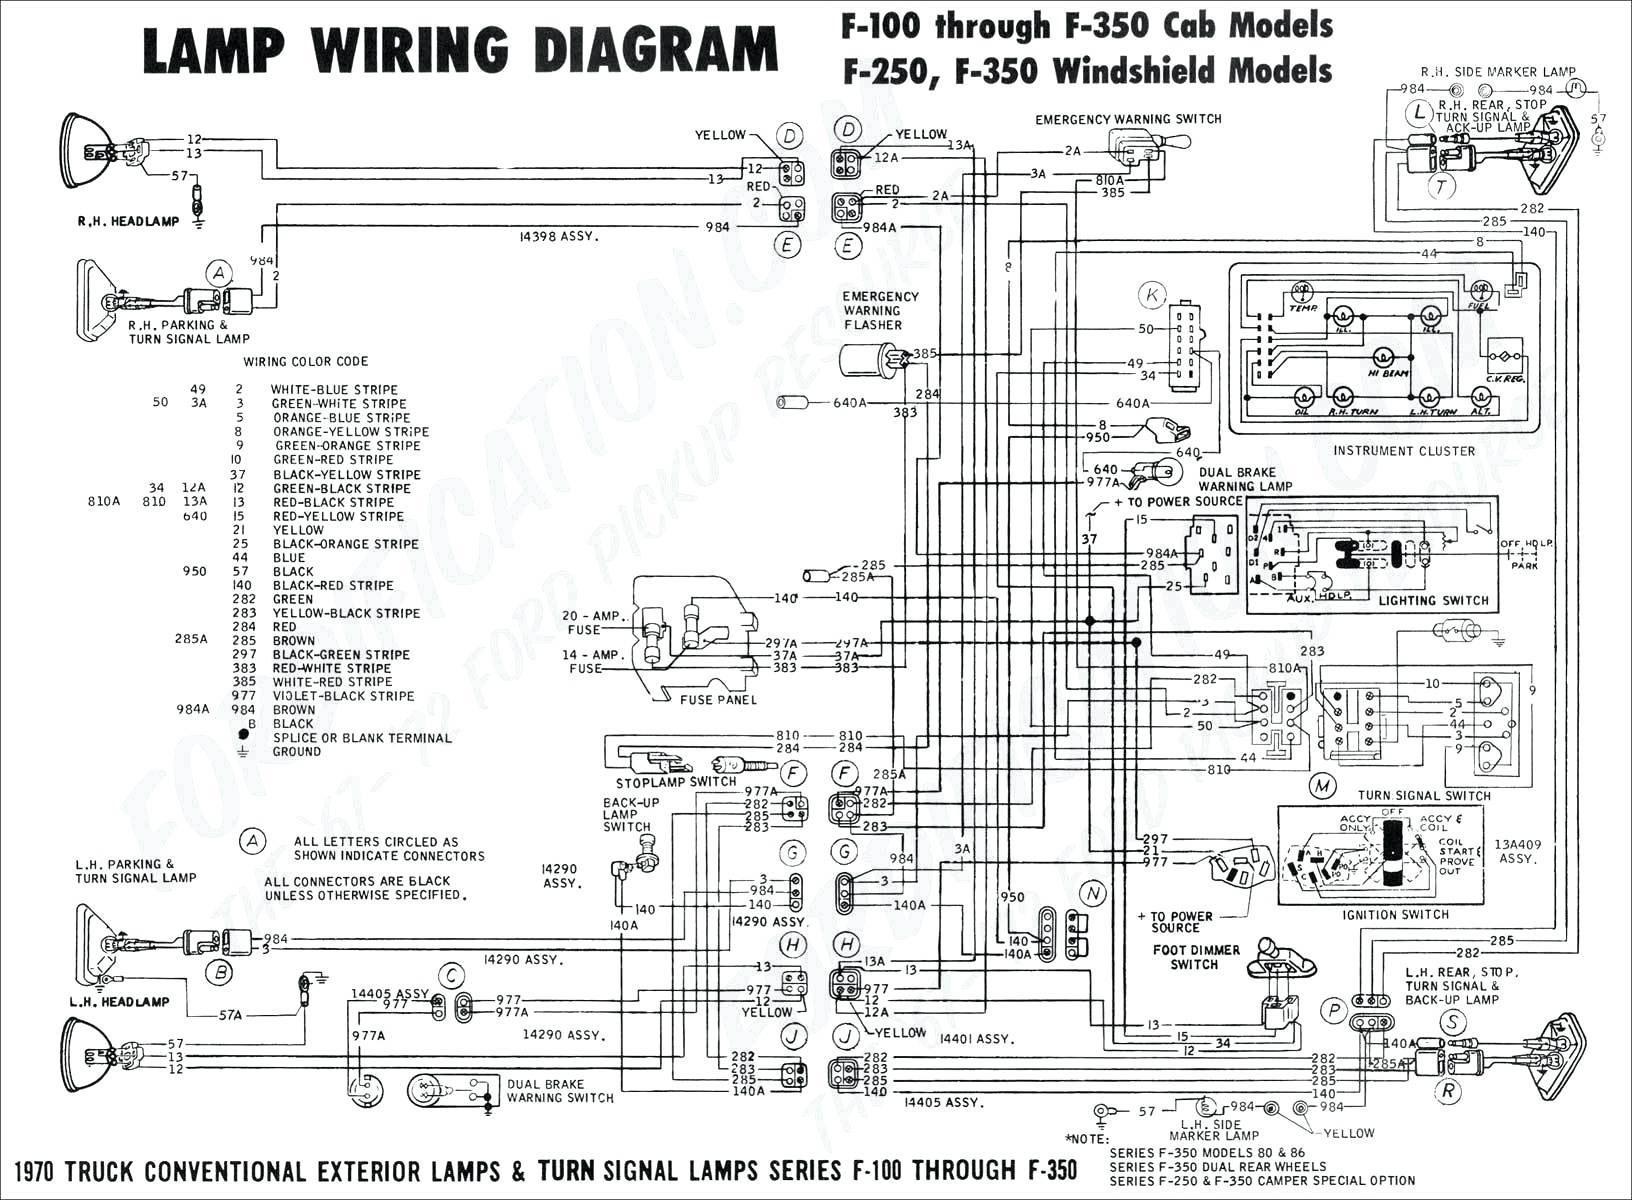 1989 omc wiring diagram